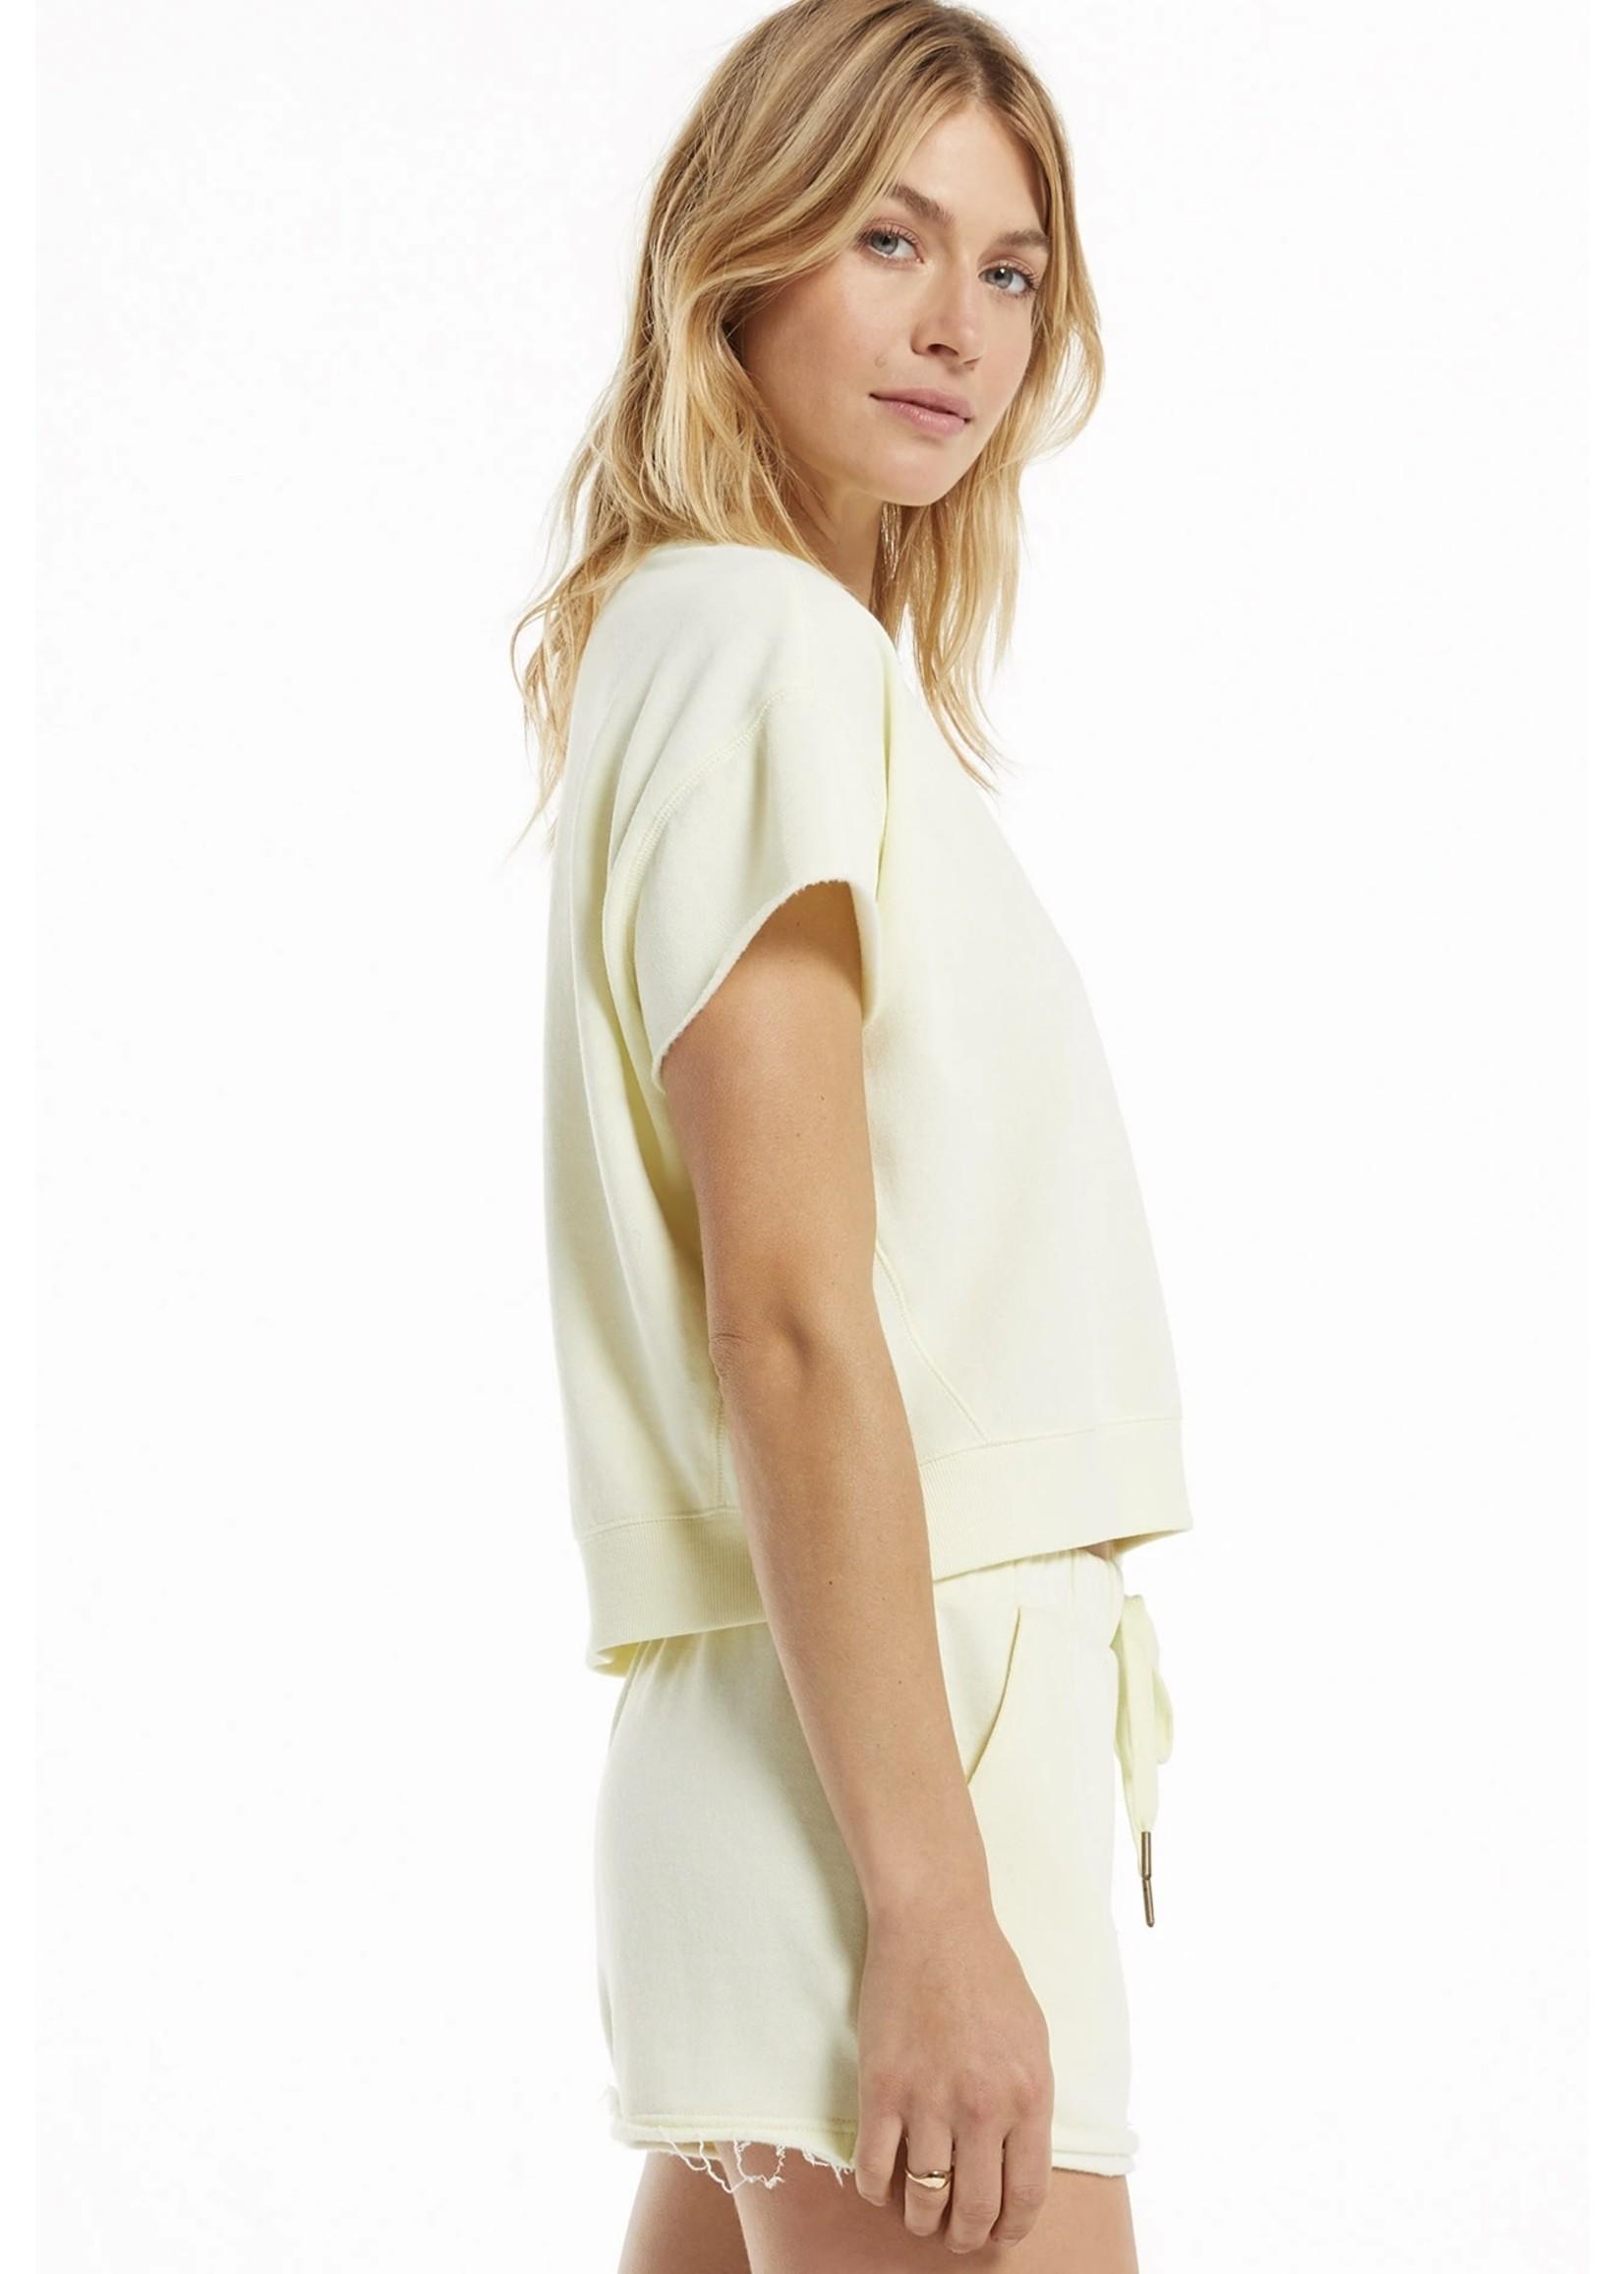 Z Supply Adah Fleece Short Sleeved Top - ZT213913